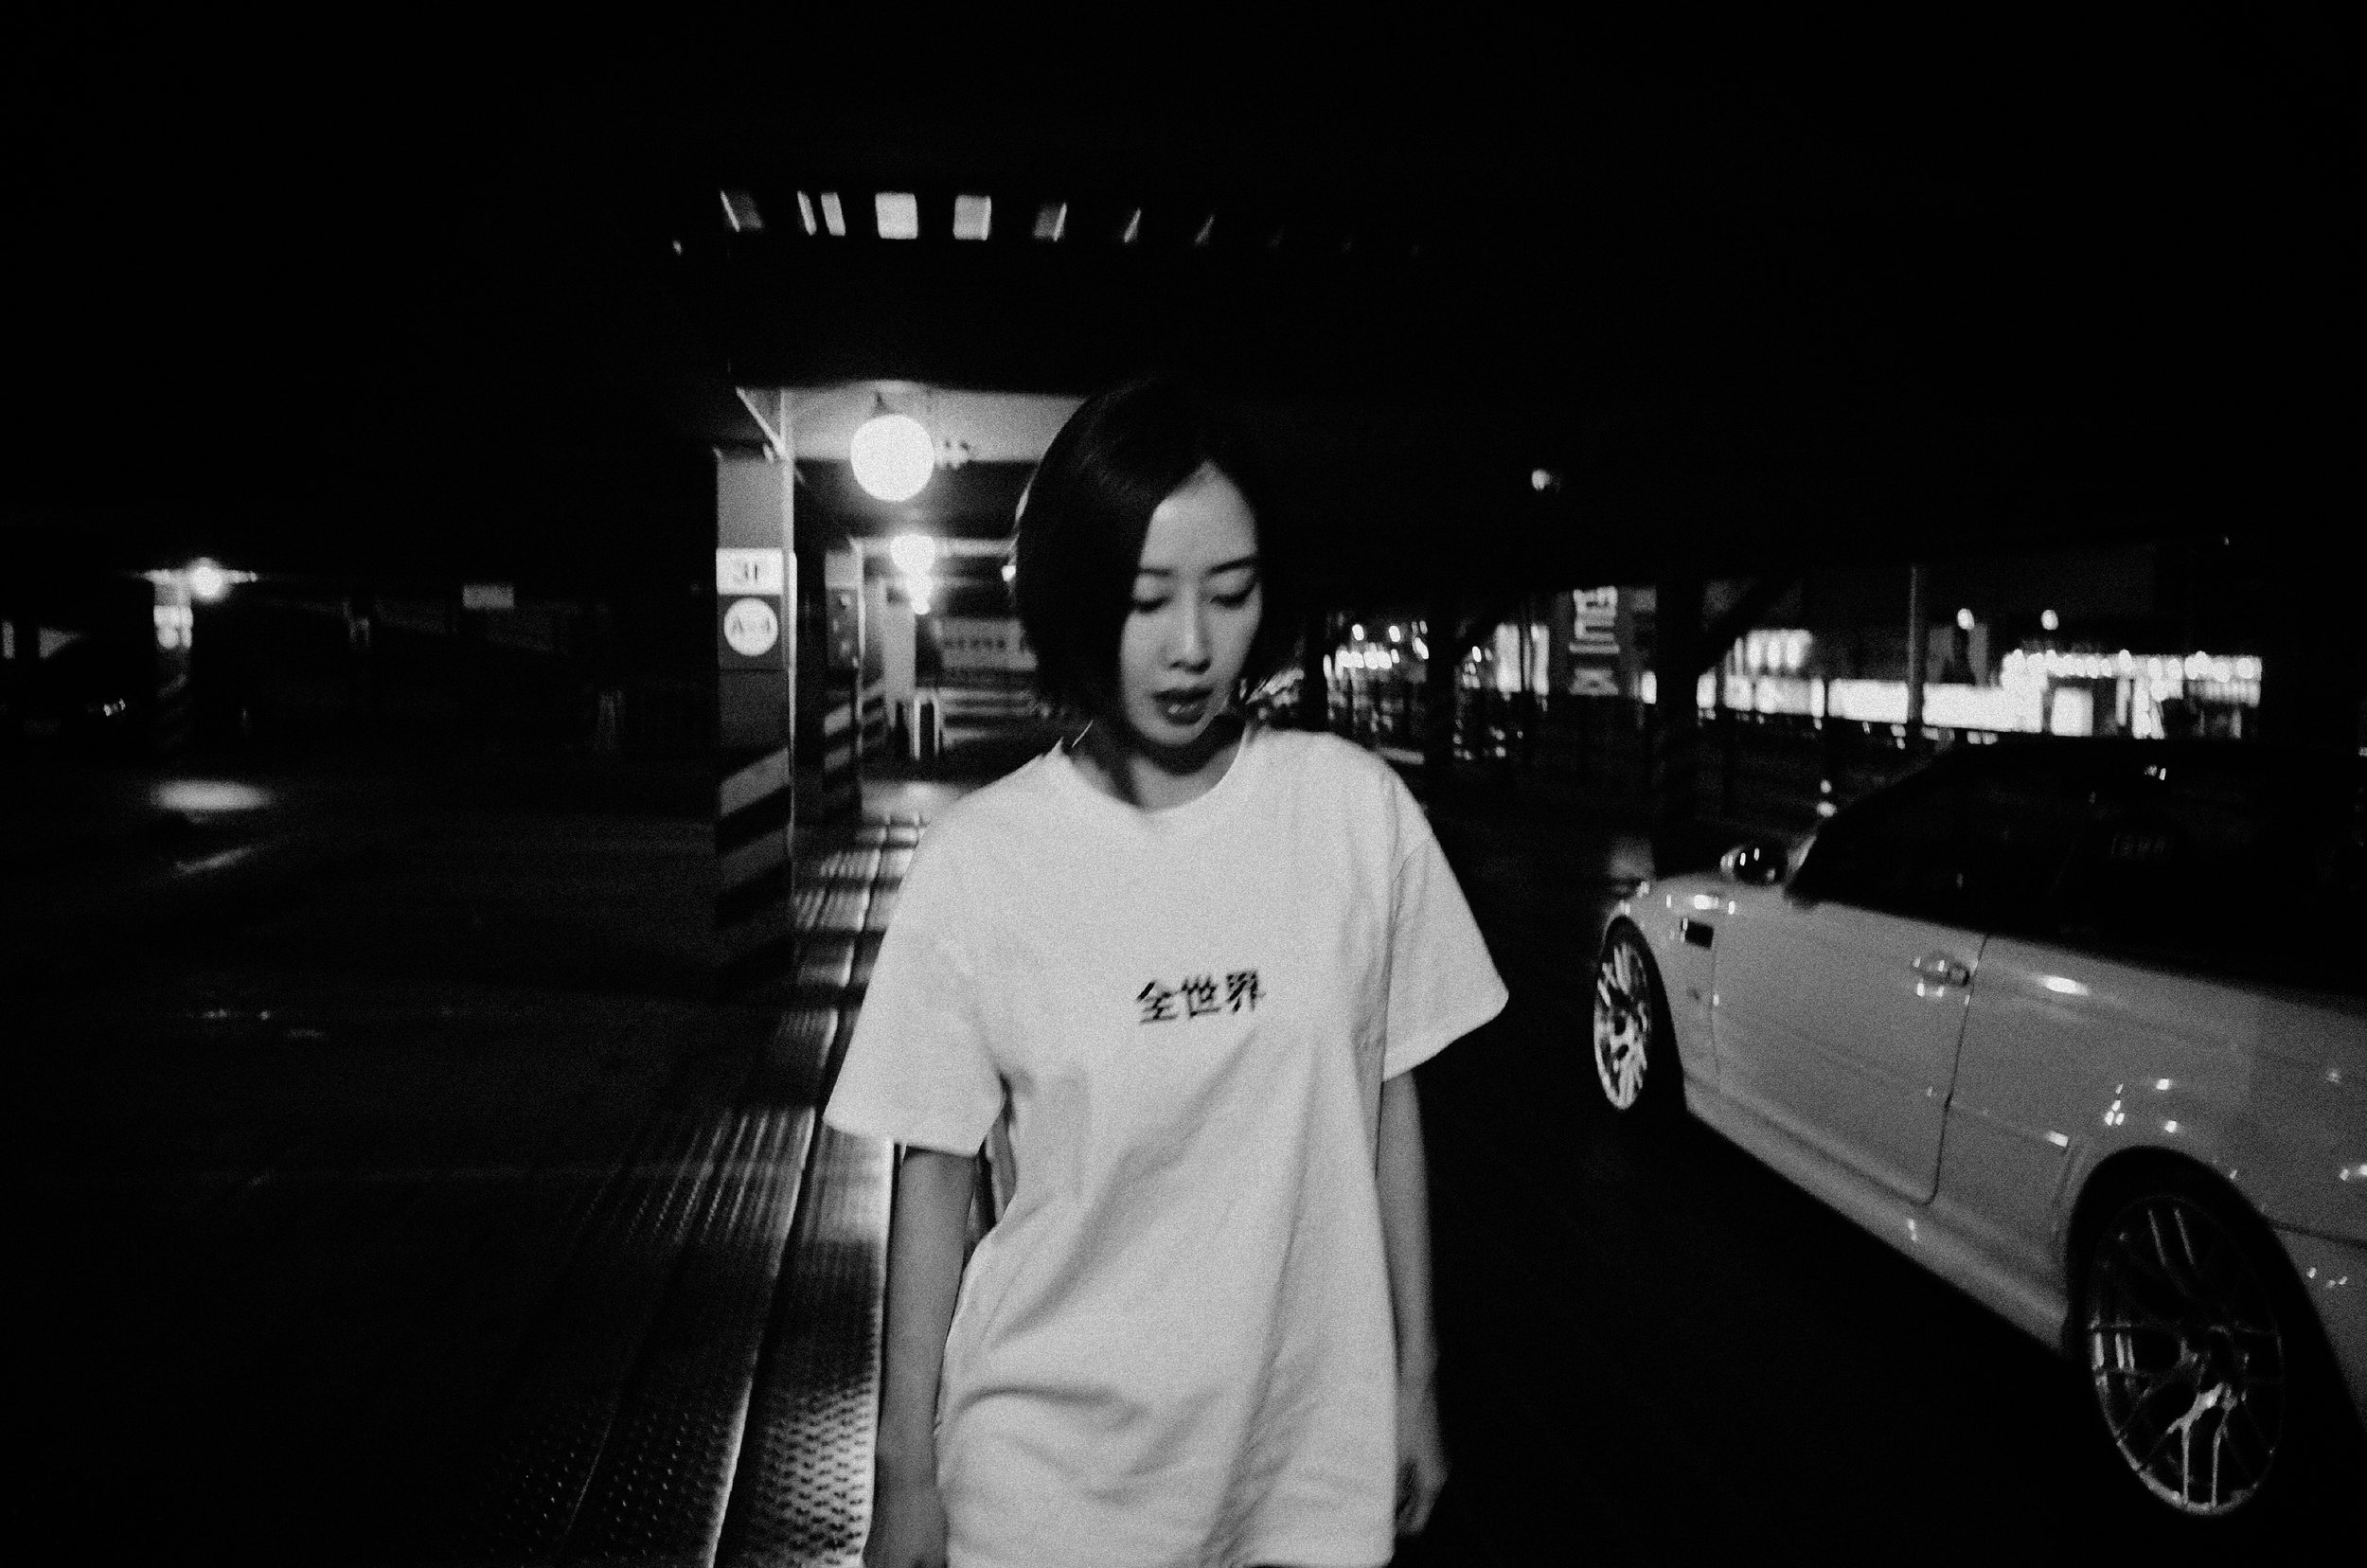 [Peaches] E46 Night-out - 全世界-5.jpg